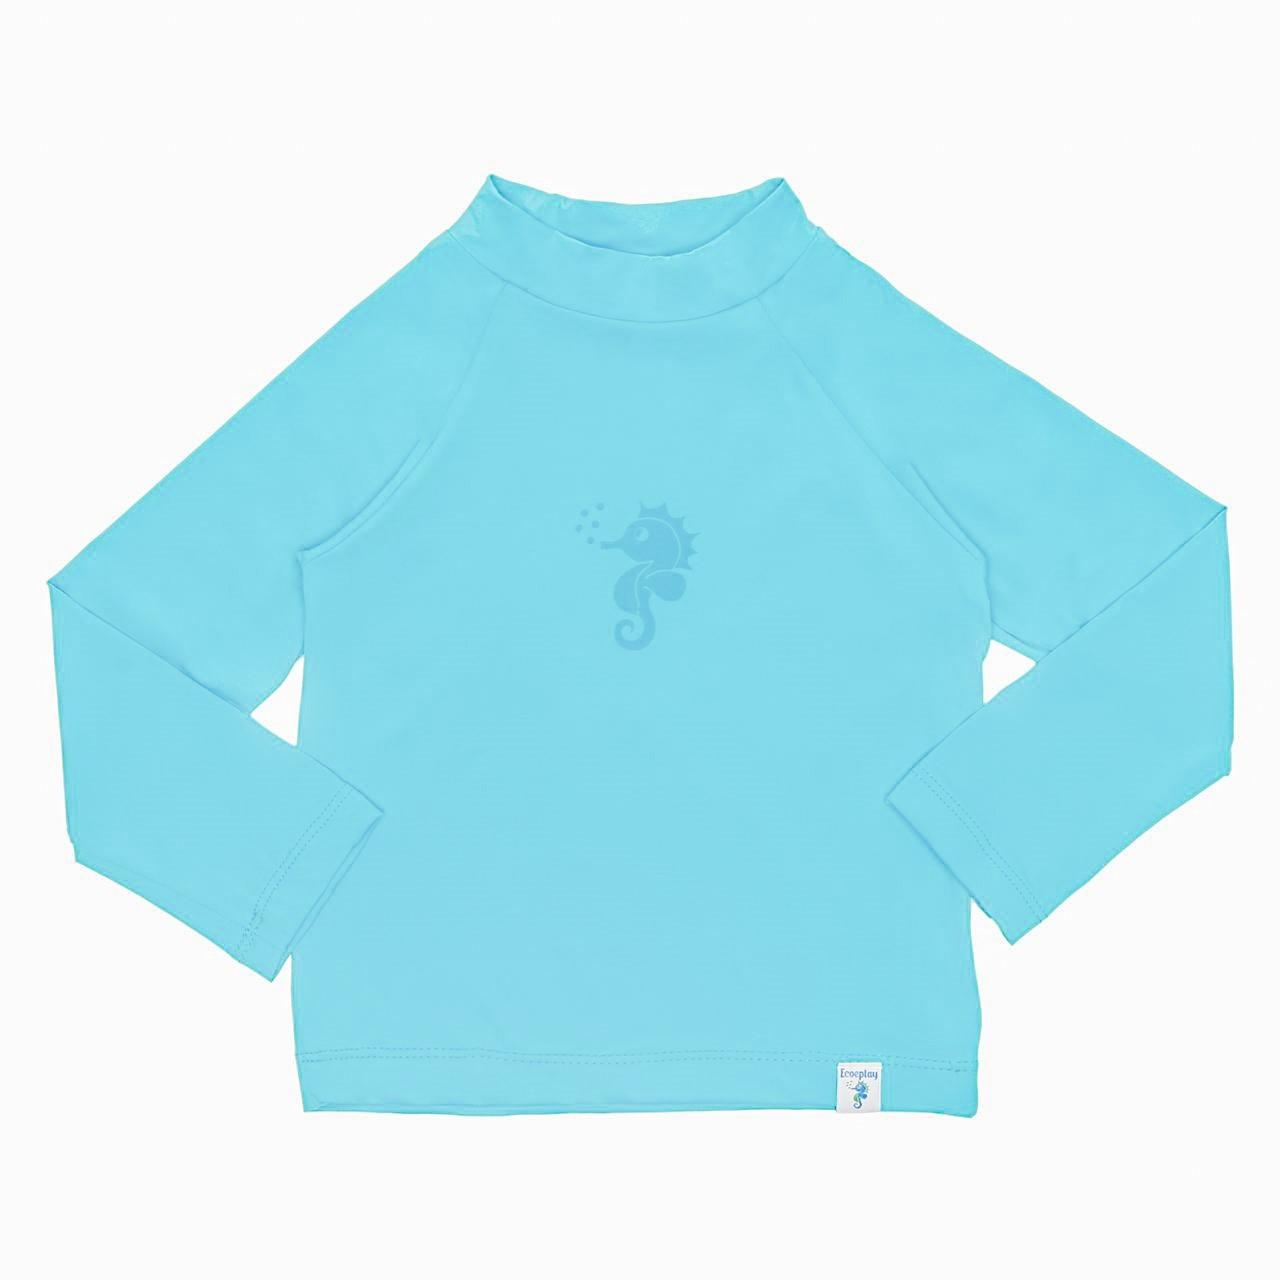 Camisa Manga Longa Banho Piscina e Mar FPU50 Azul - Ecoeplay